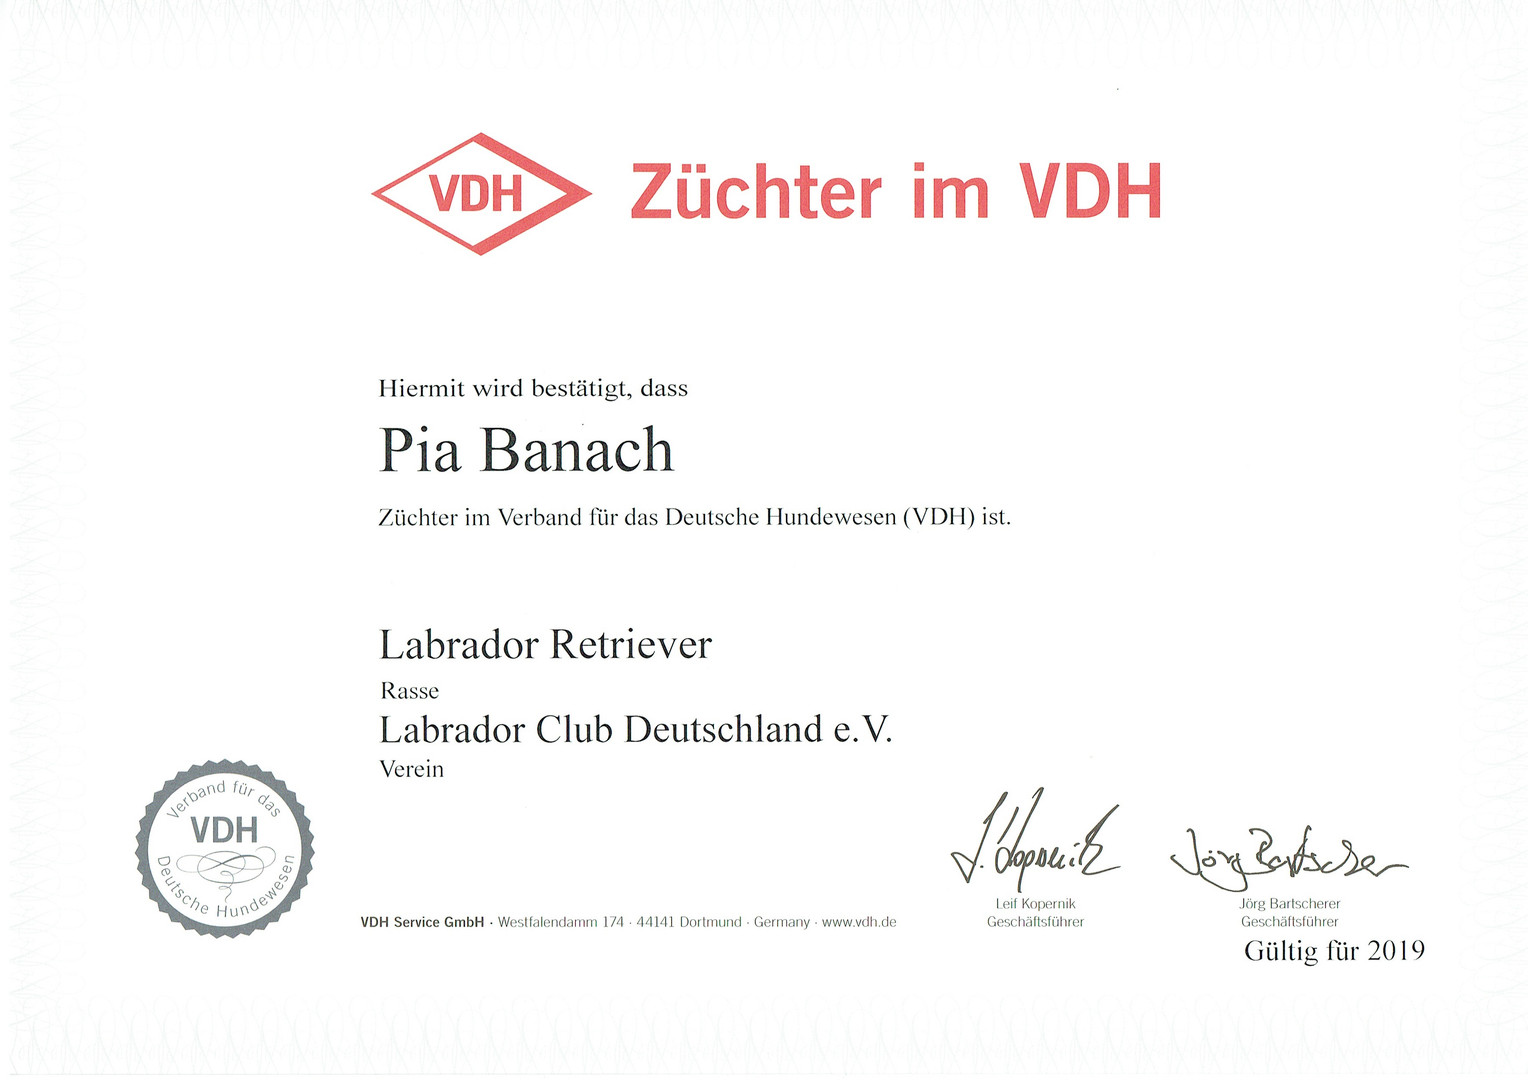 VDH 2019 Urkunde.jpg